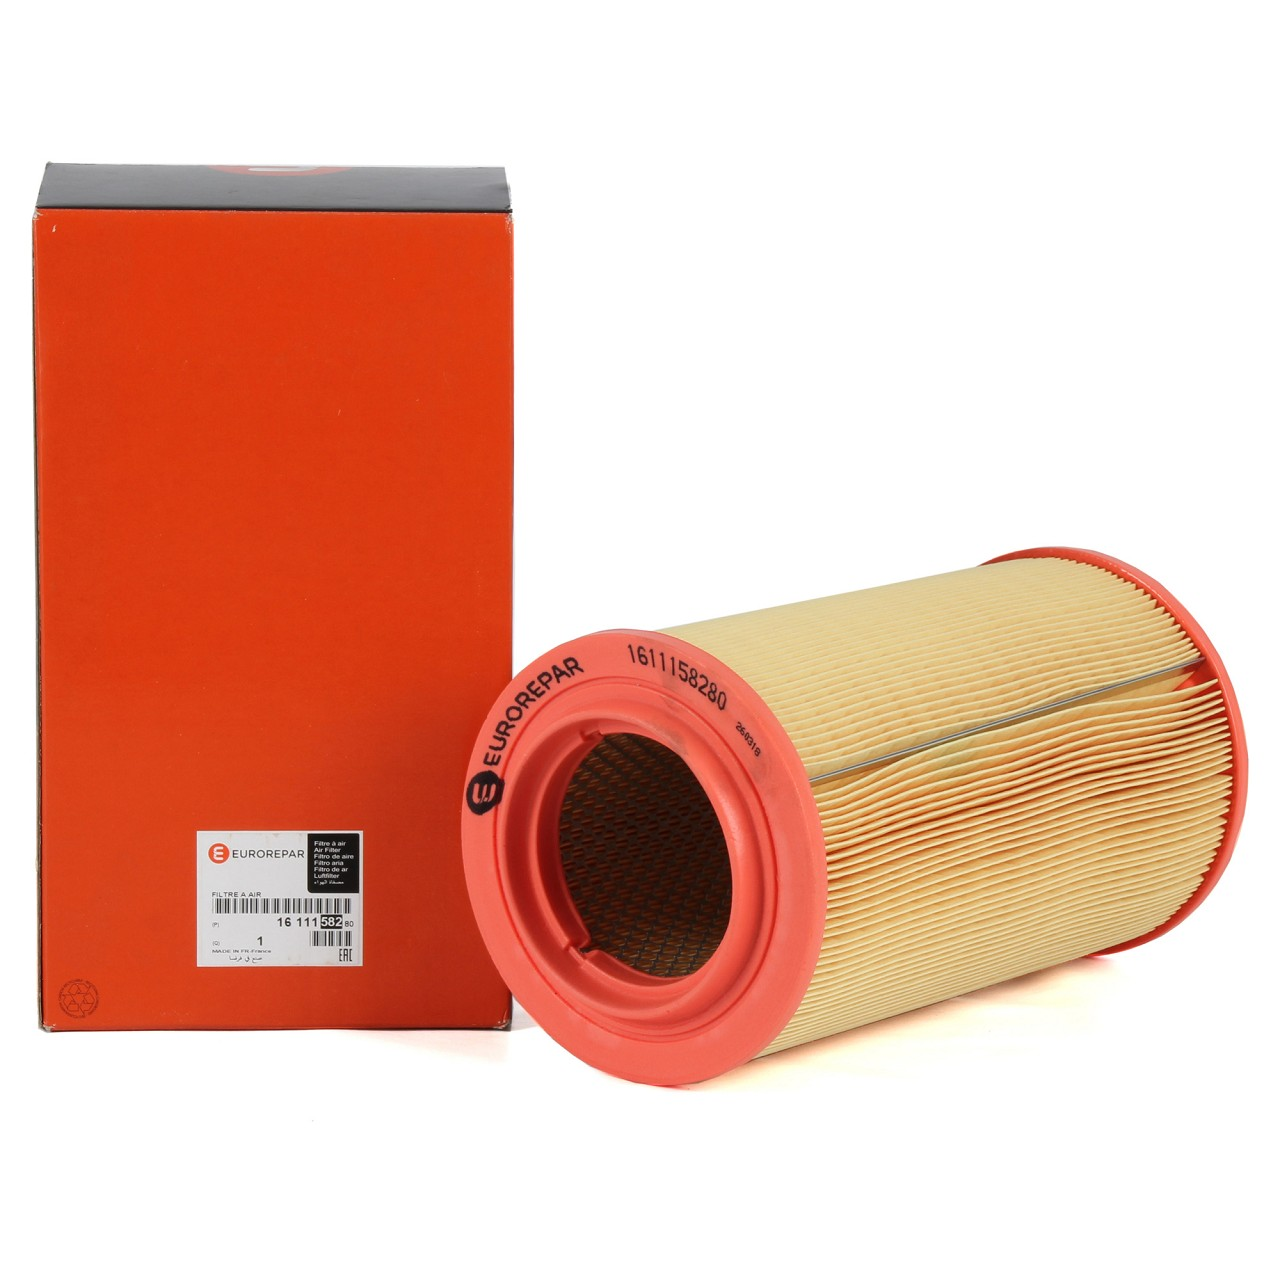 ORIGINAL PSA EUROREPAR Luftfilter JUMPER BOXER 2.0/2.2/3.0 HDi 1611158280